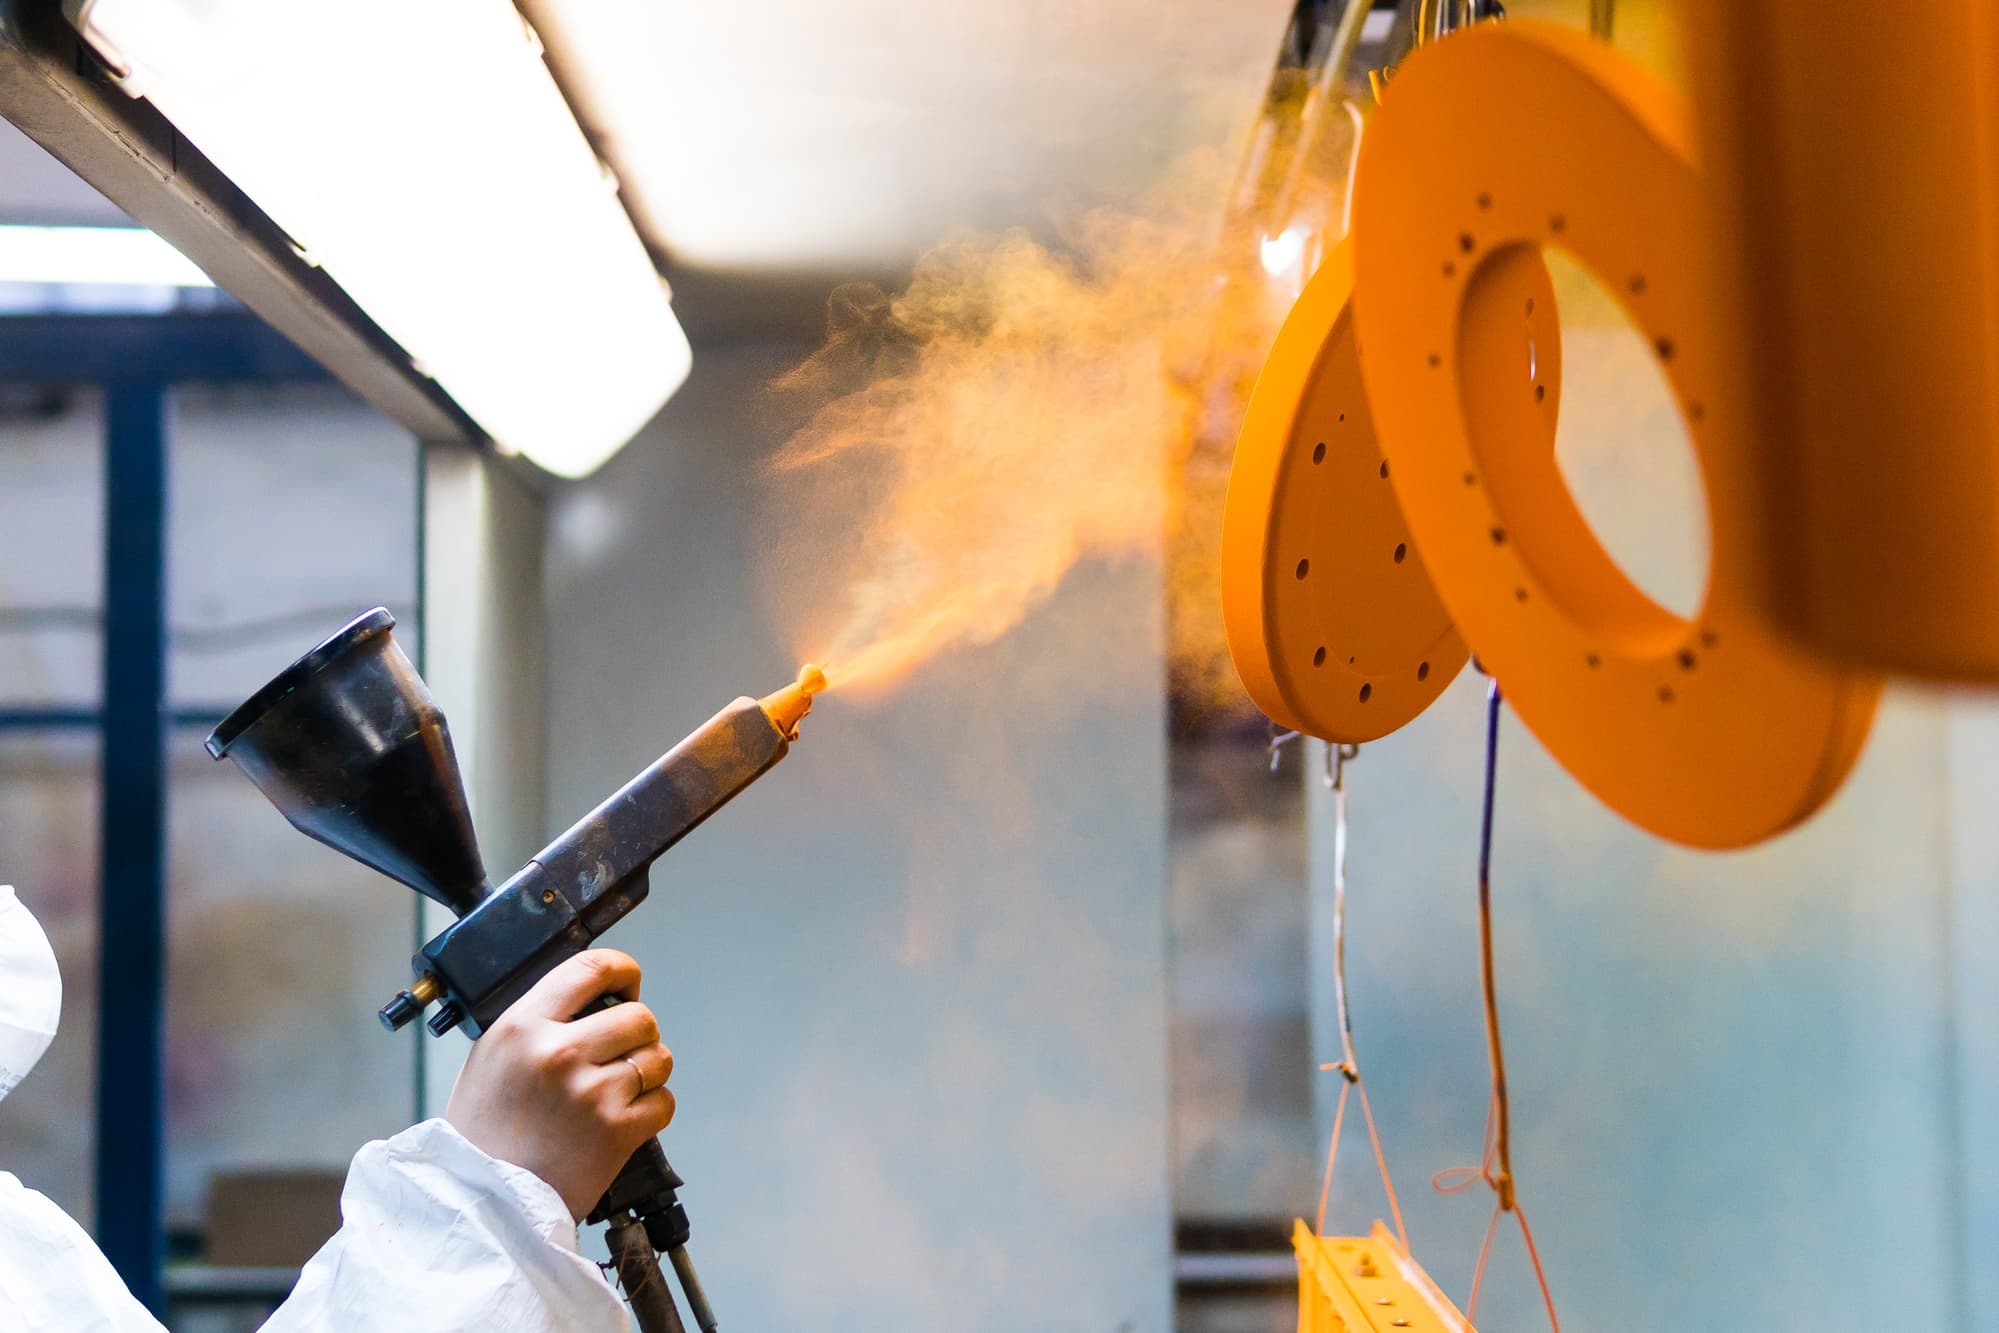 Powder coating of metal parts